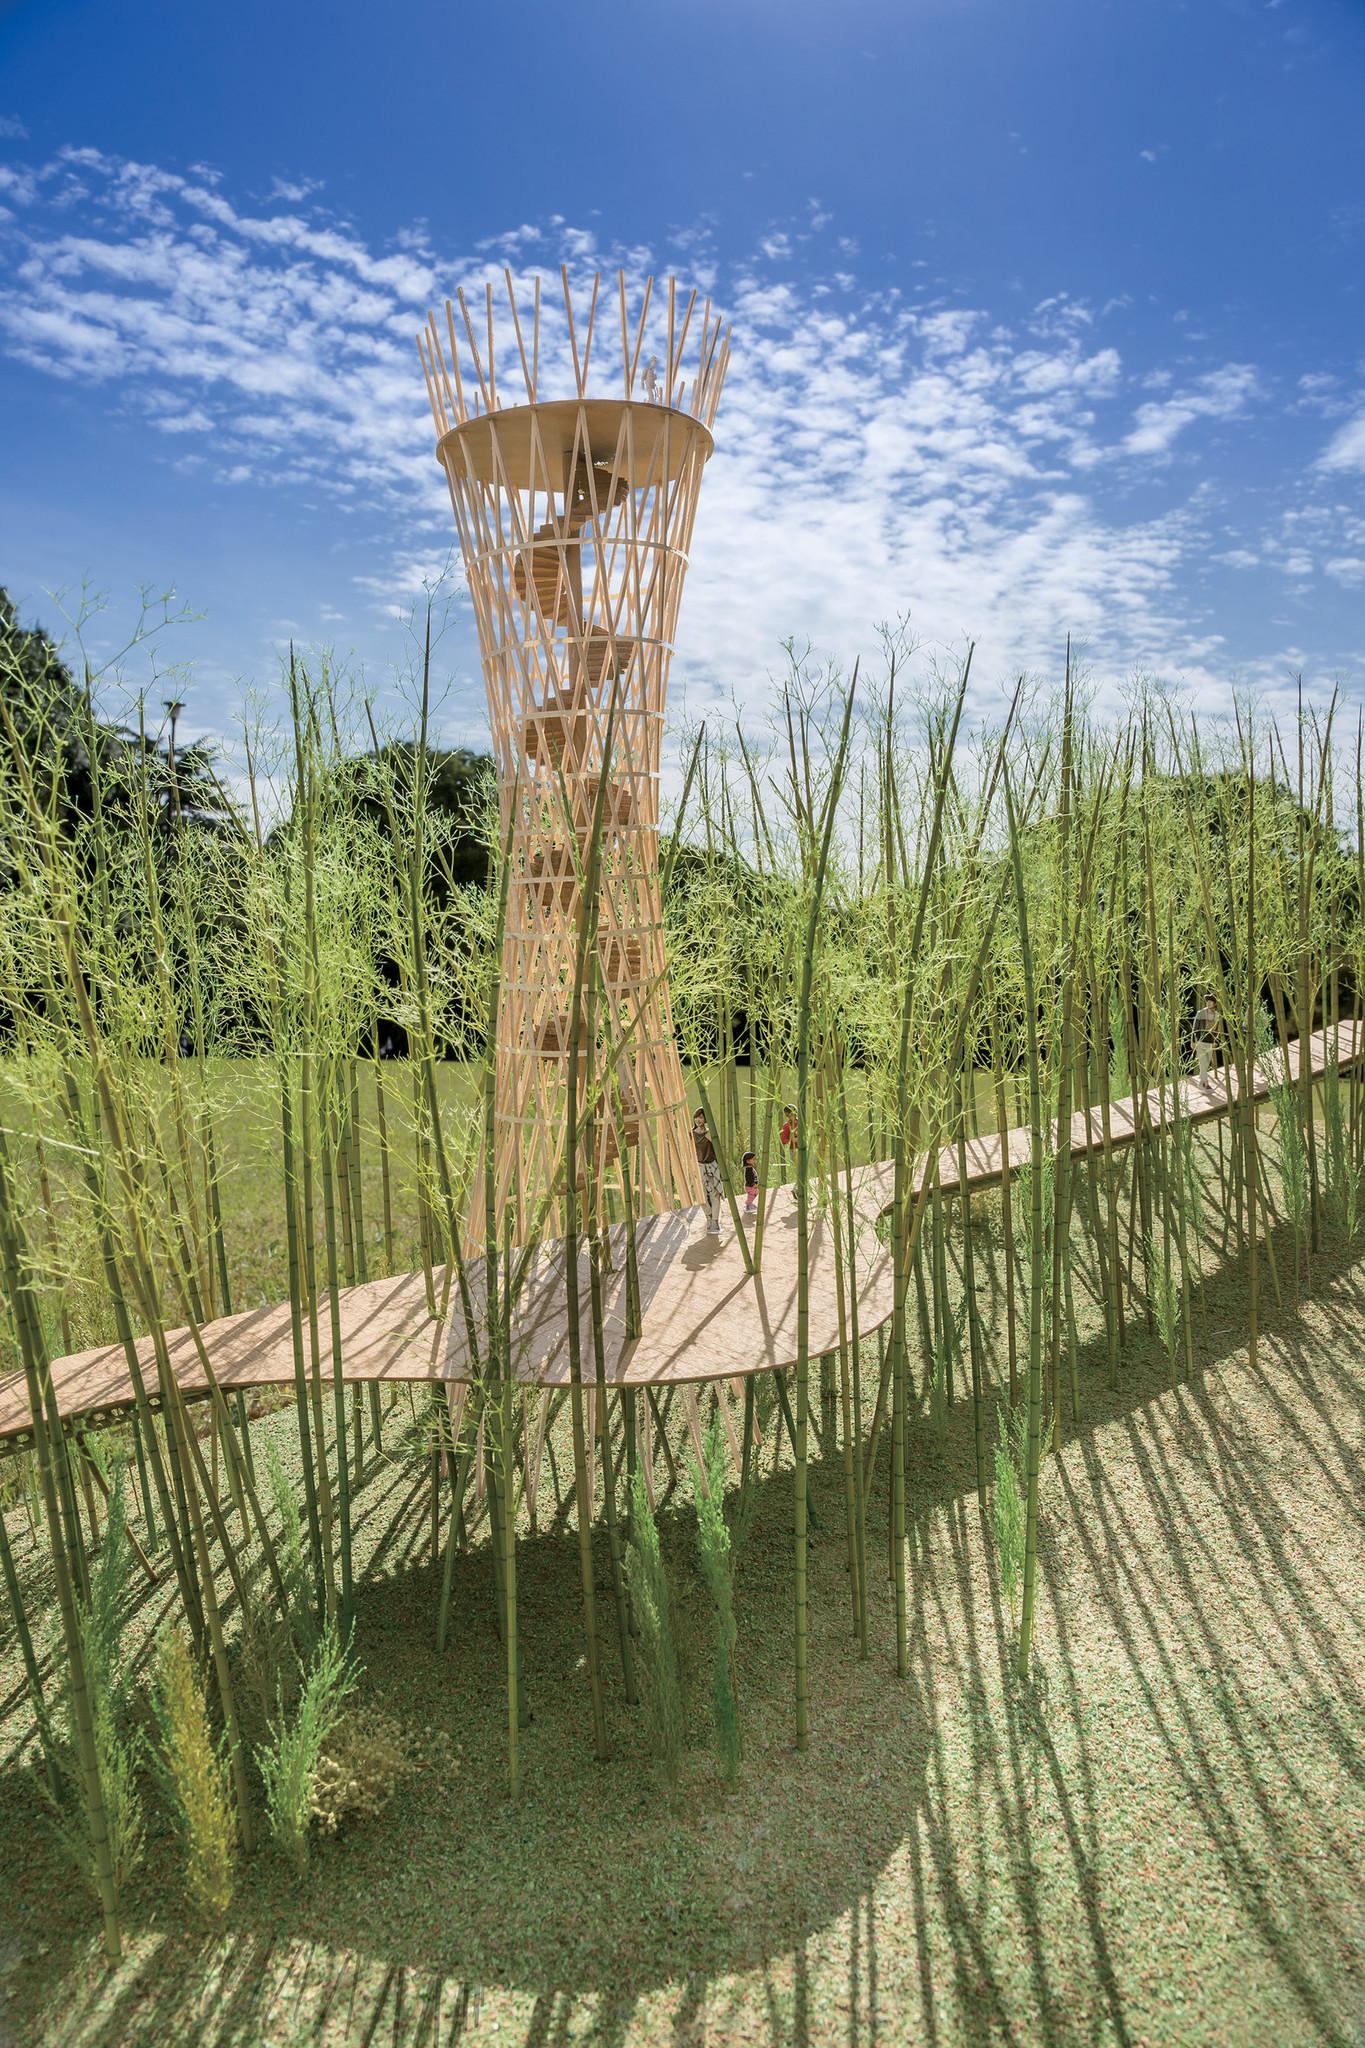 Jae-Eun Choi and Shigeru Ban's 2016 Venice Architectural Biennale proposal